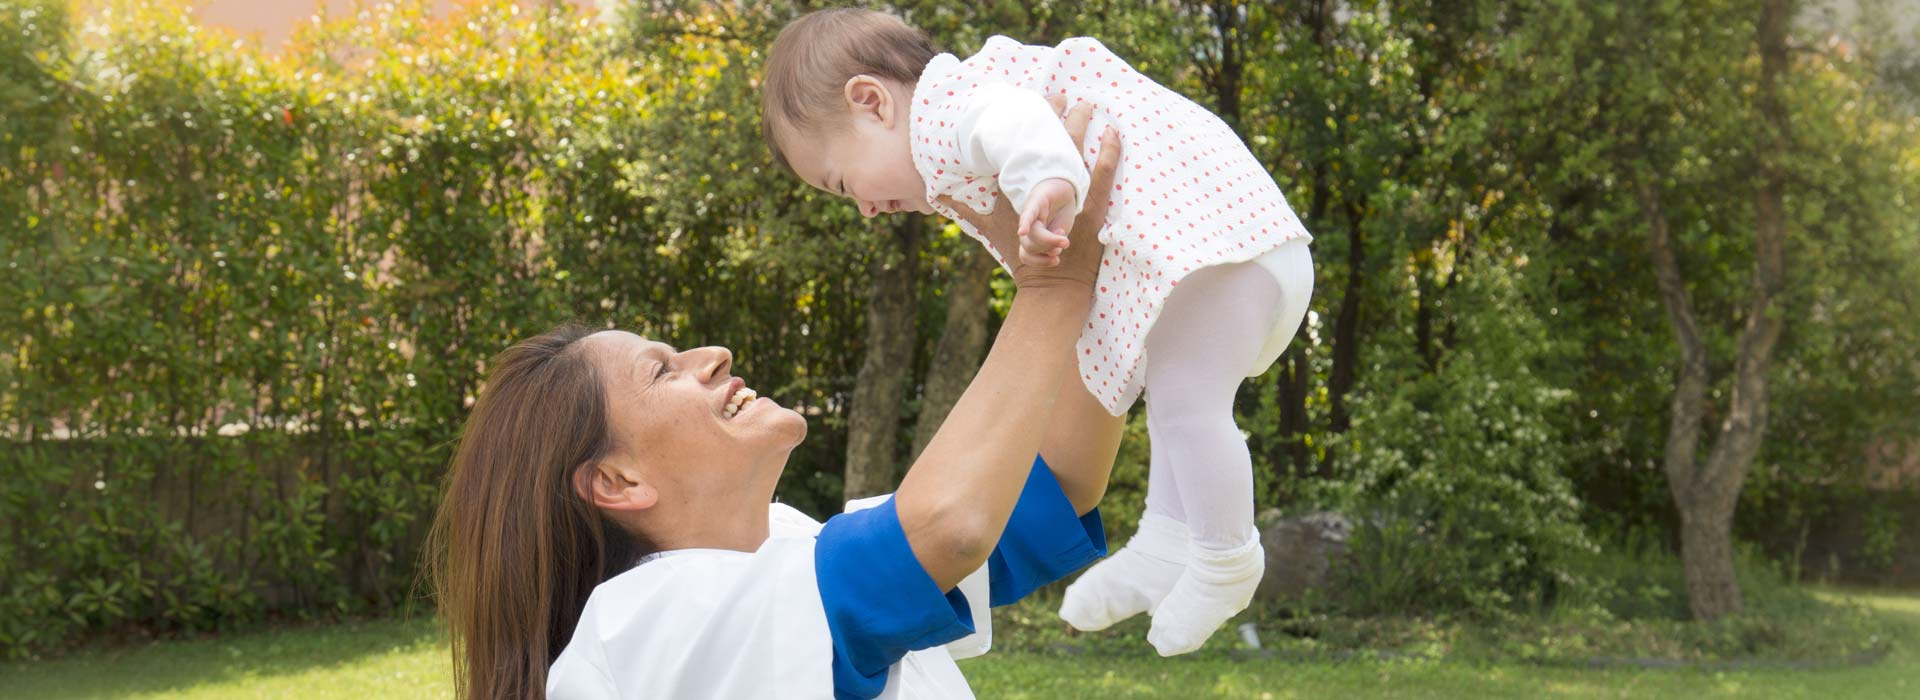 consulente-puericultrice-specializzata-maria-cerna